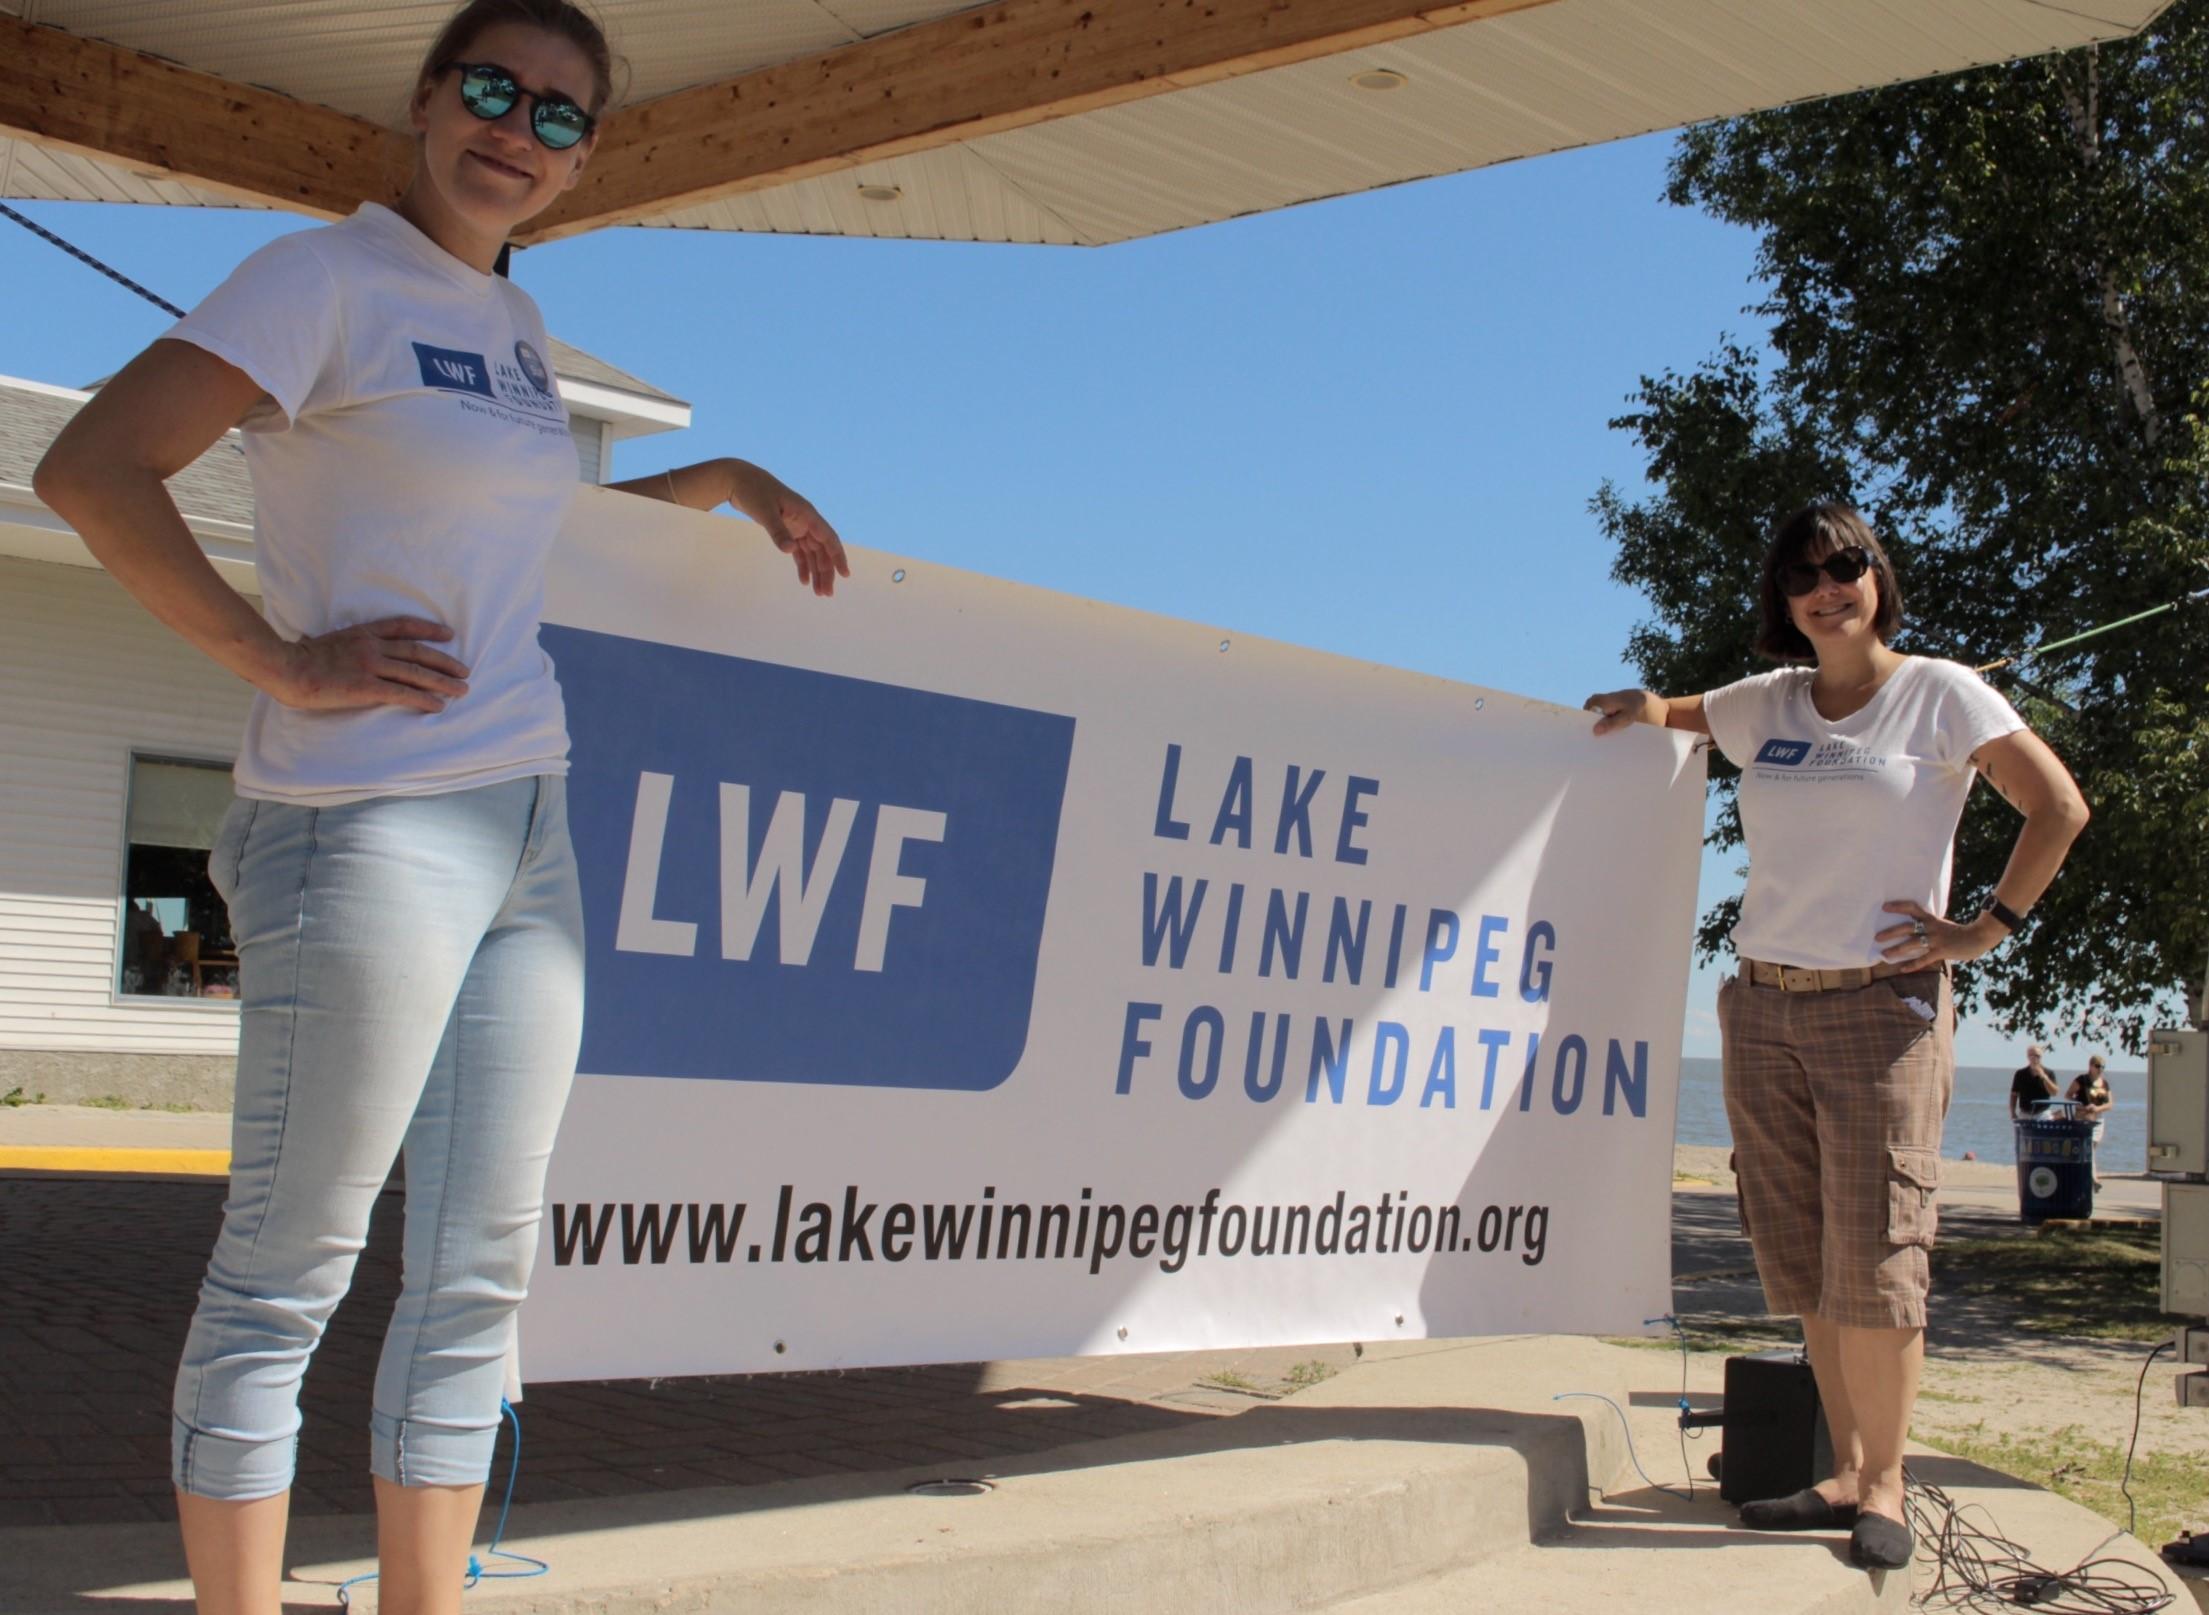 Freshwater fish jobs winnipeg - Lake Winnipeg Foundation Job Posting